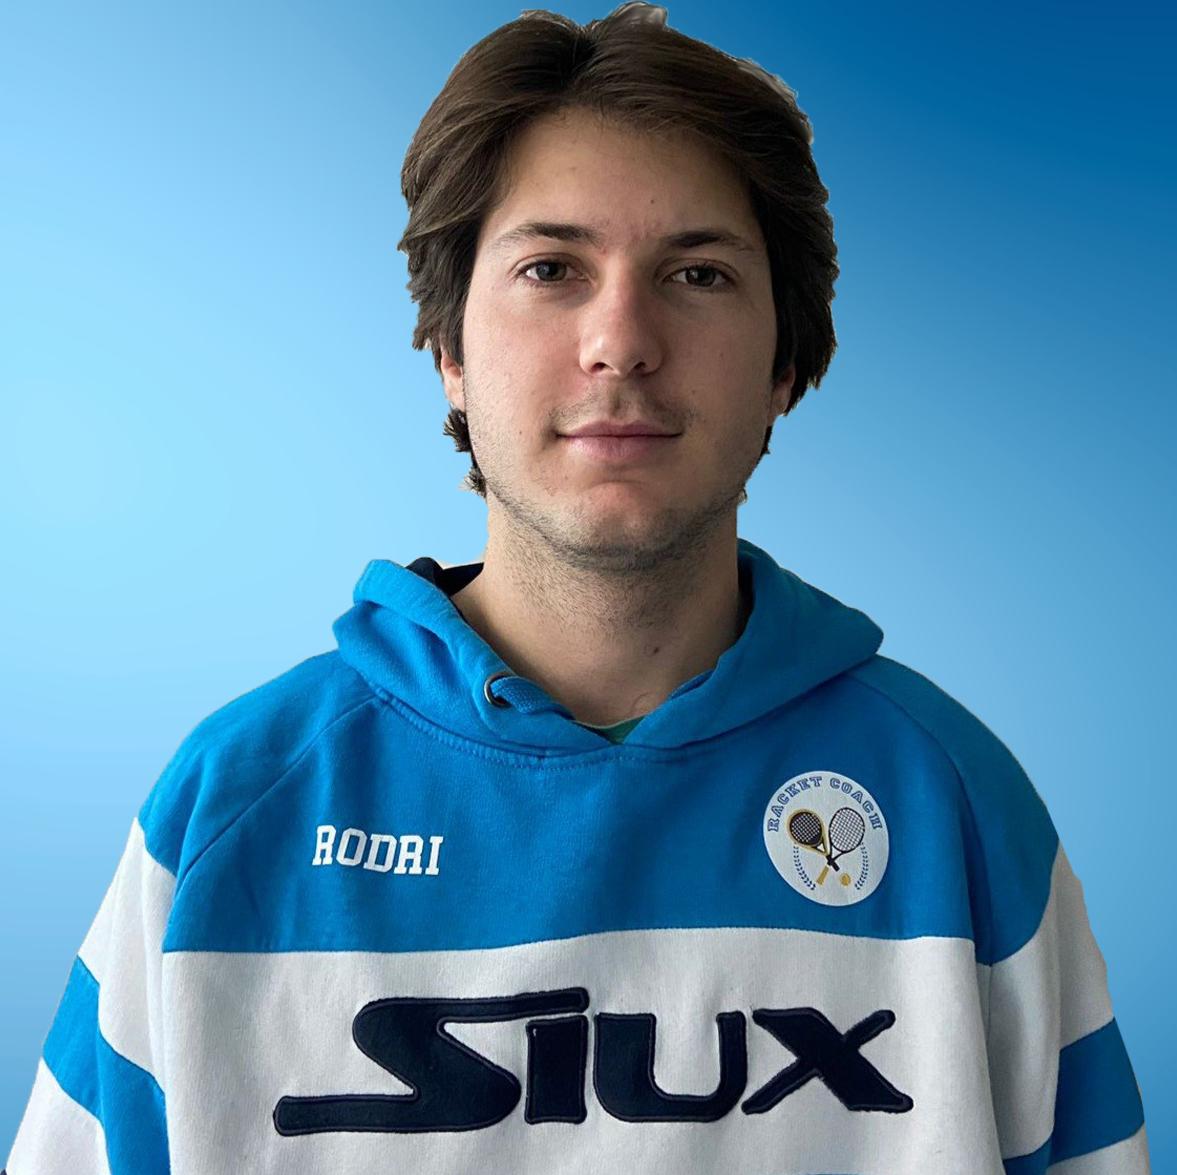 Rodrigo Iglesias